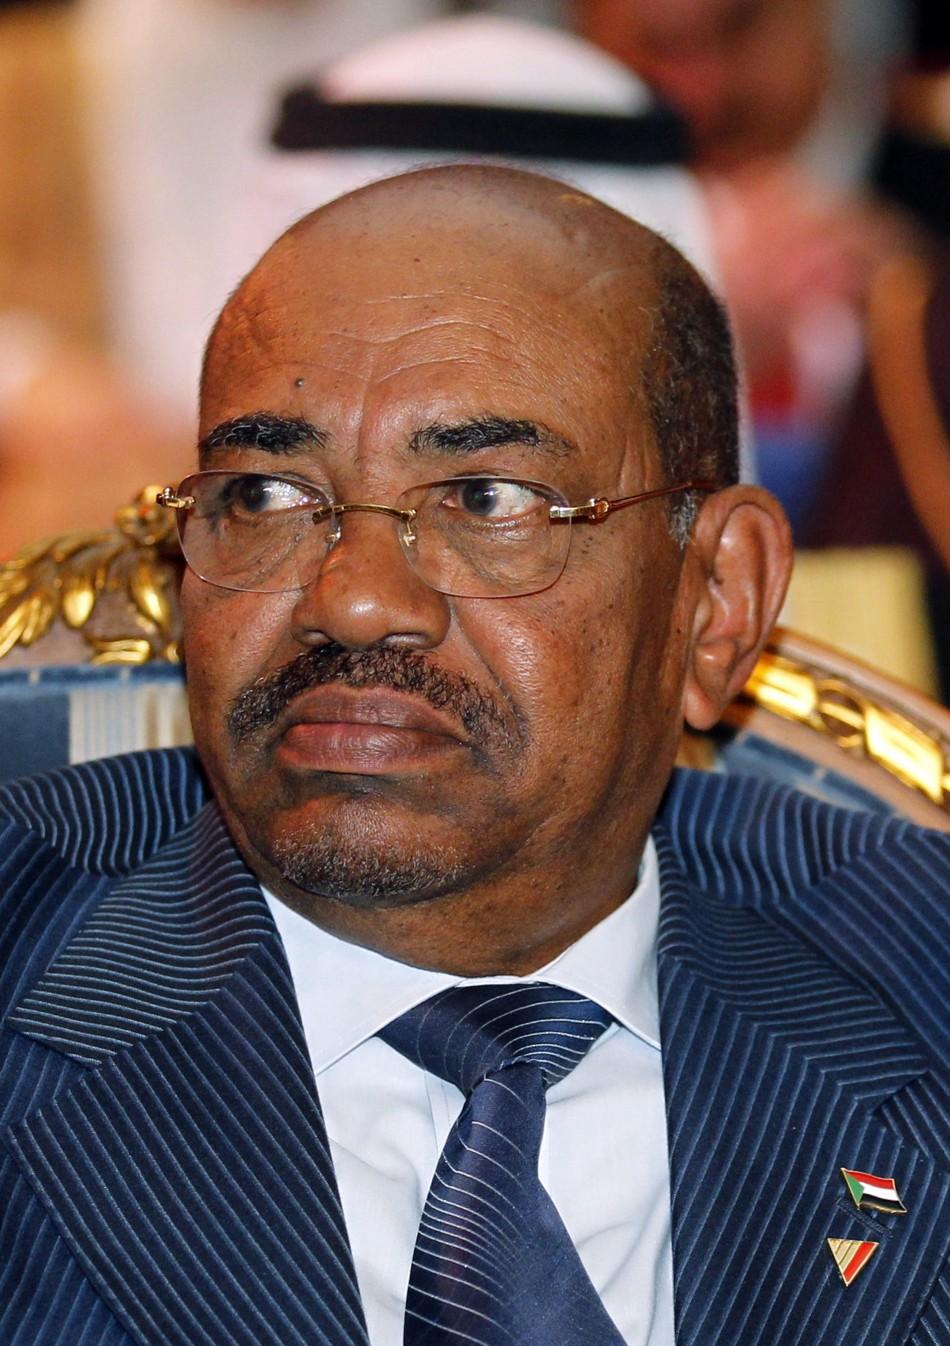 Sudan's President Omar Hassan al-Bashi